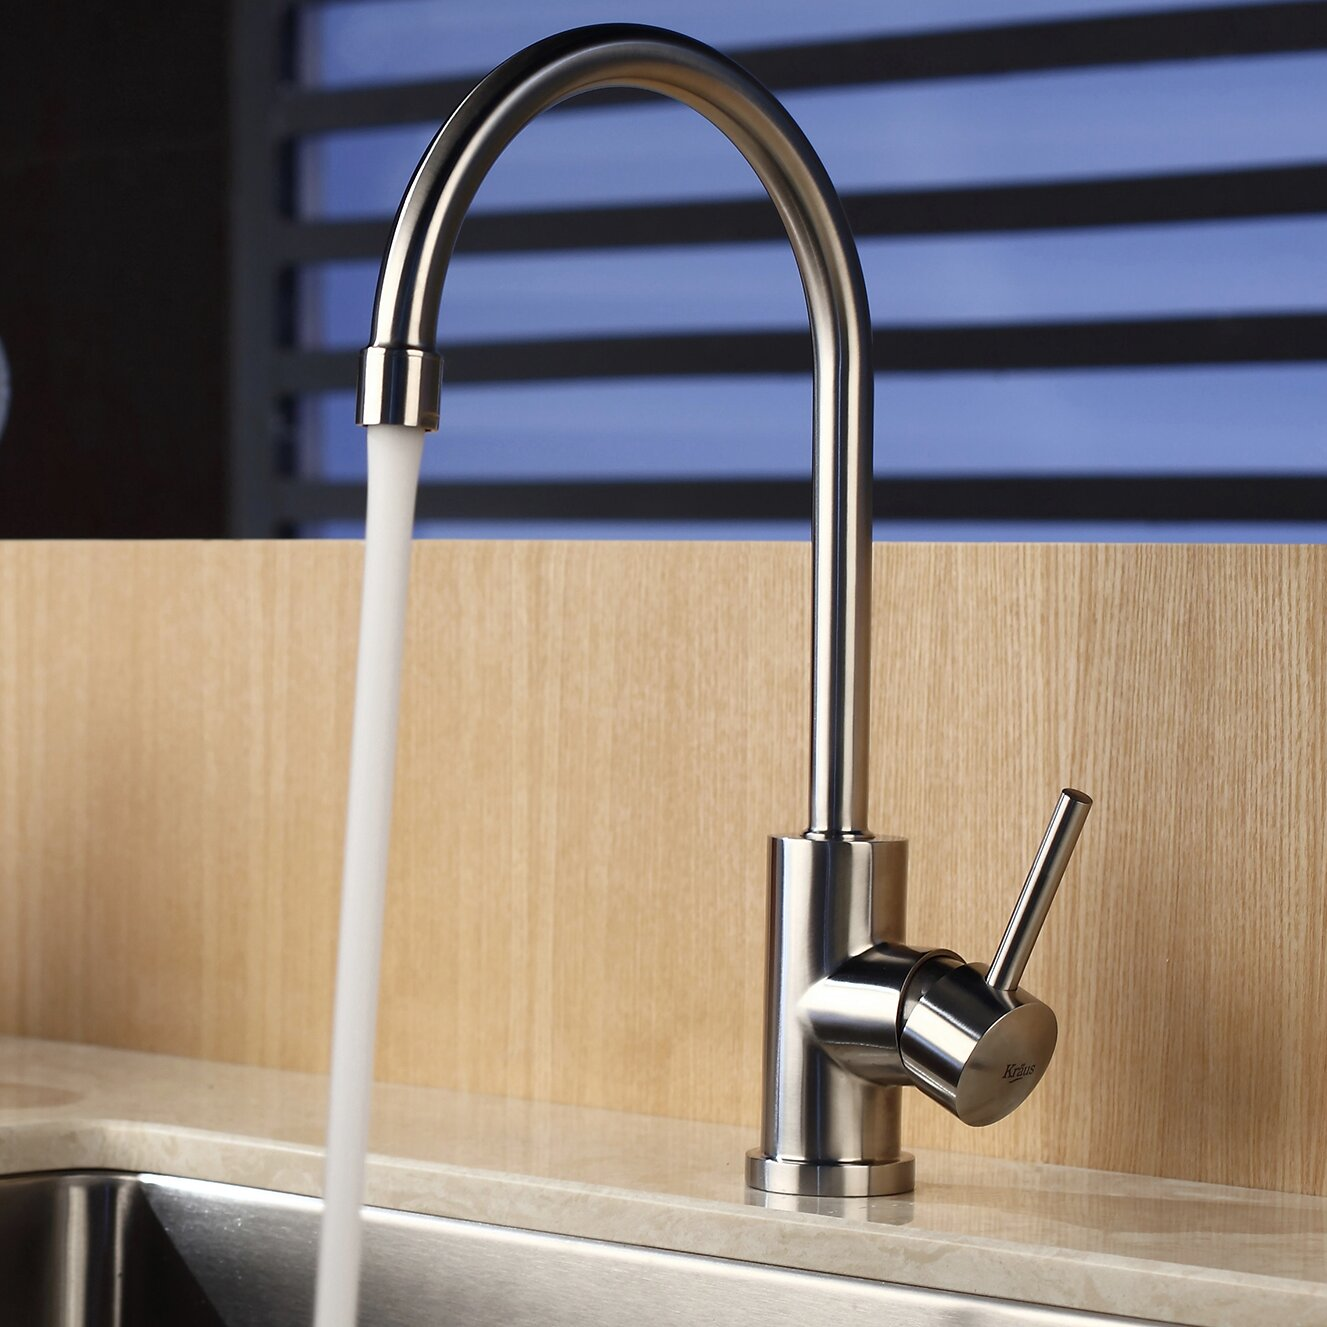 kraus one handle single hole kitchen faucet reviews